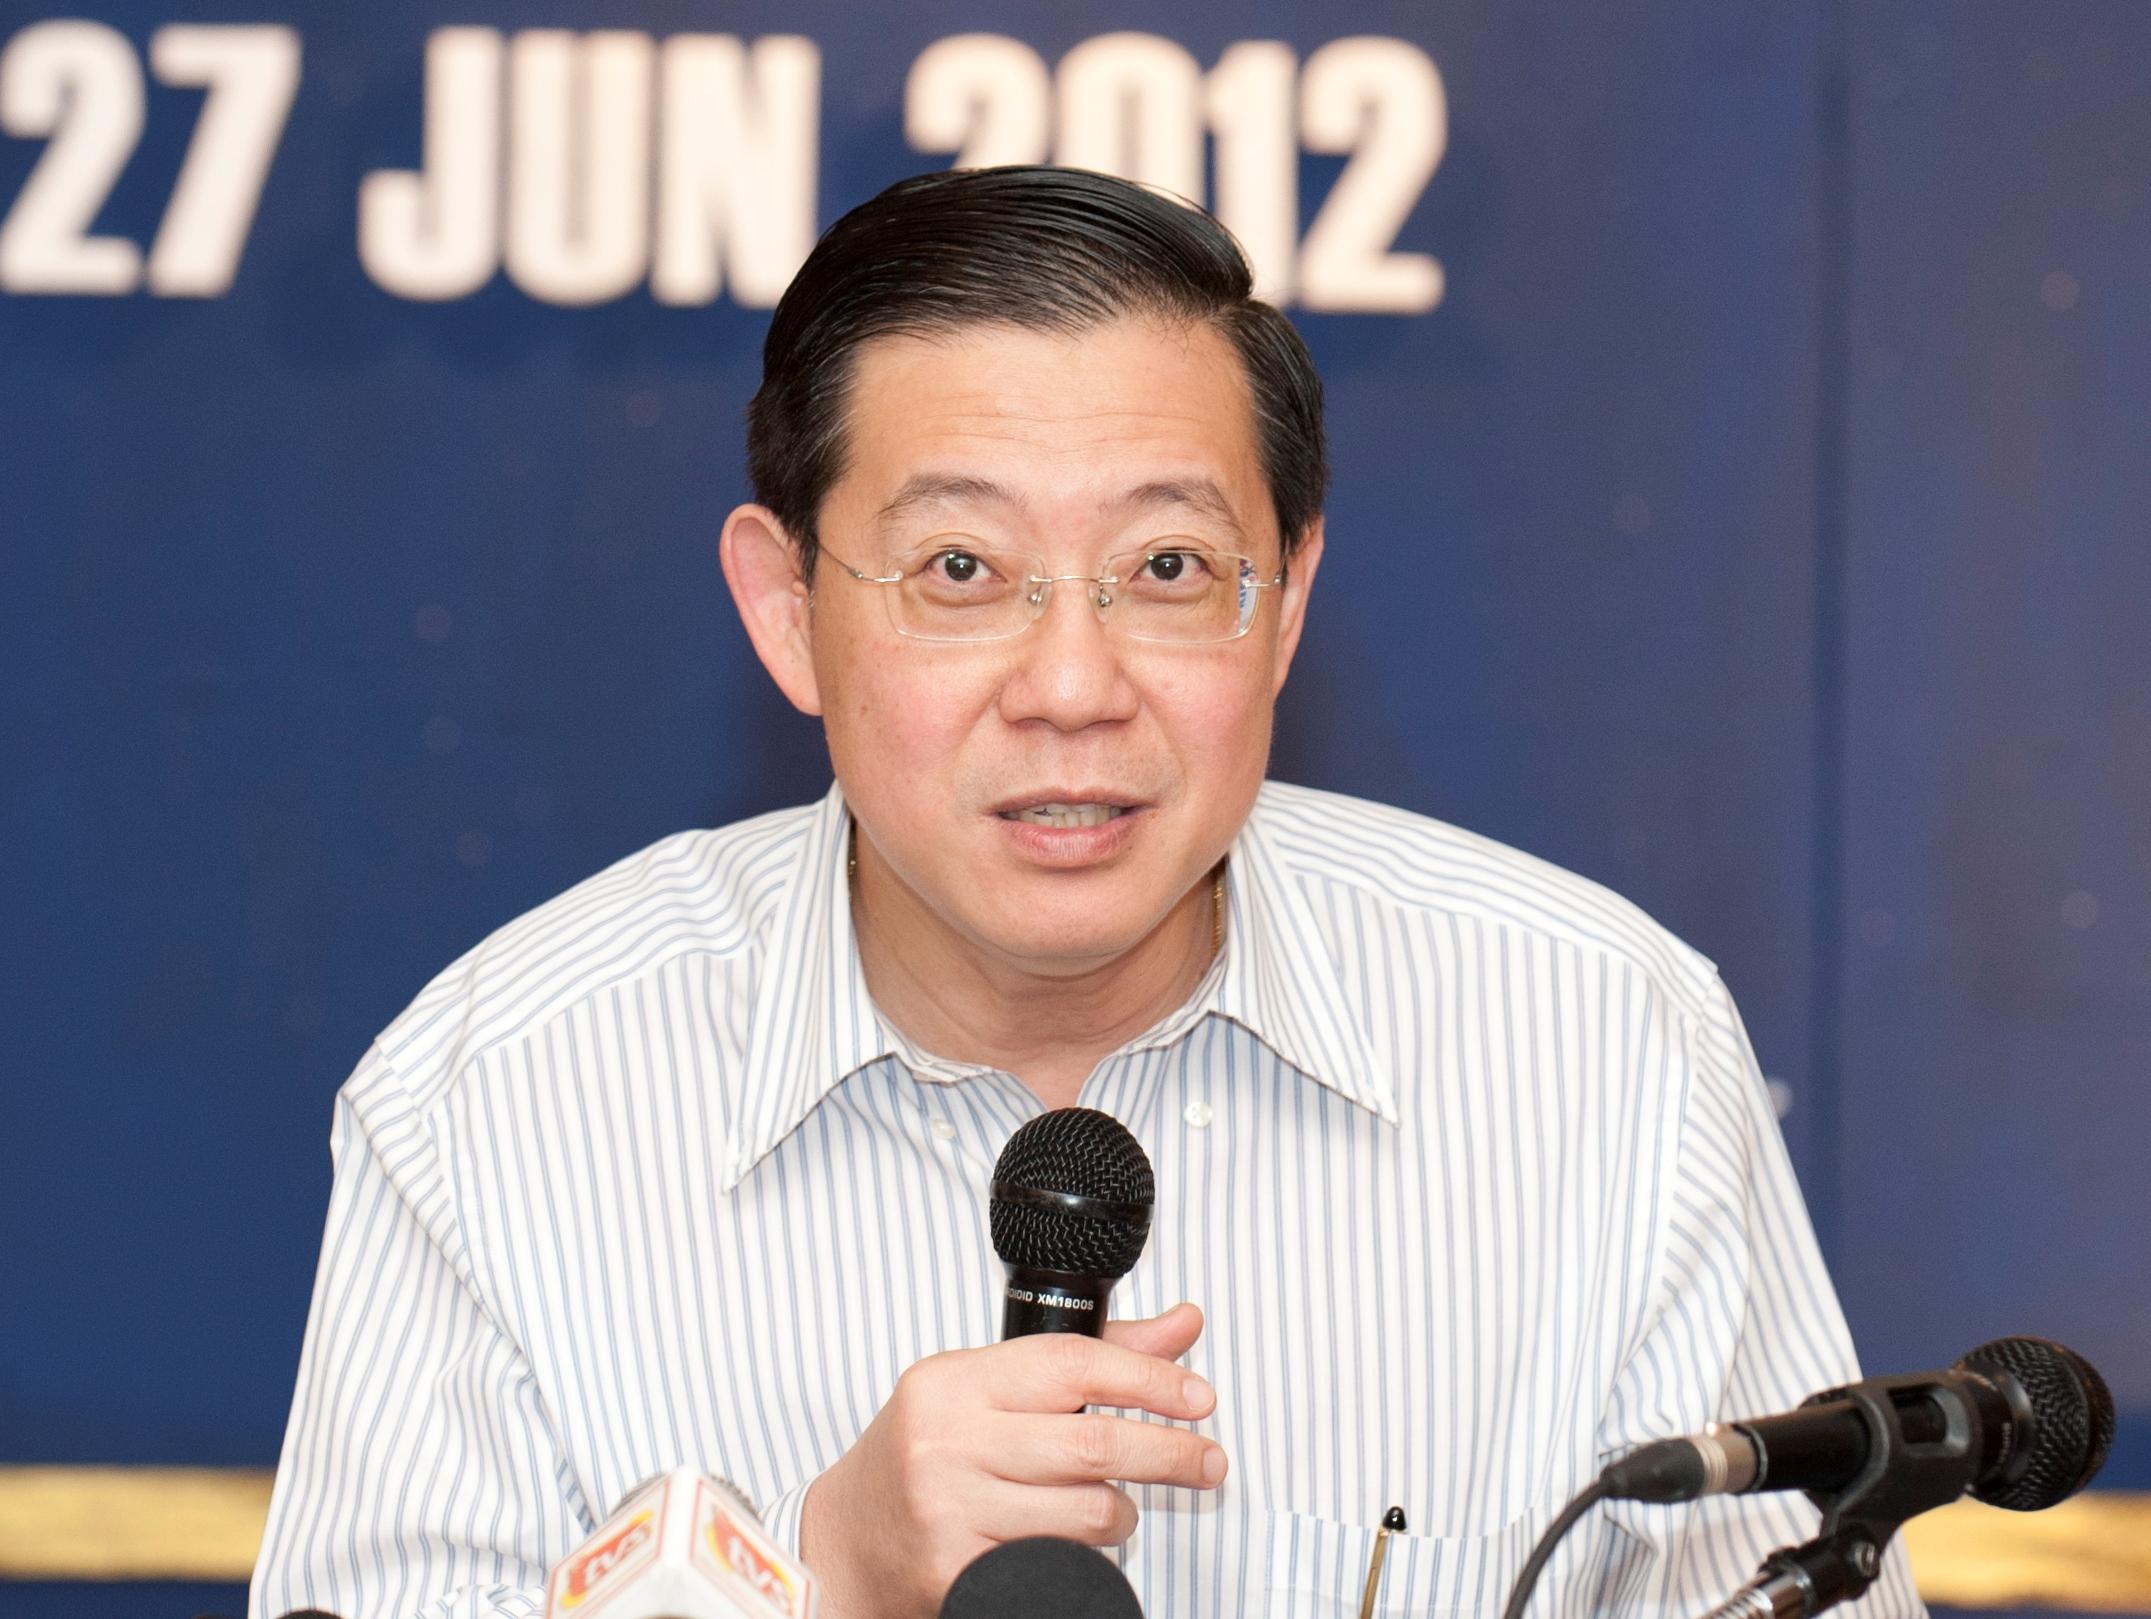 Siaran langsung TV dibatal, BN takut rakyat tonton debat Guan Eng vs